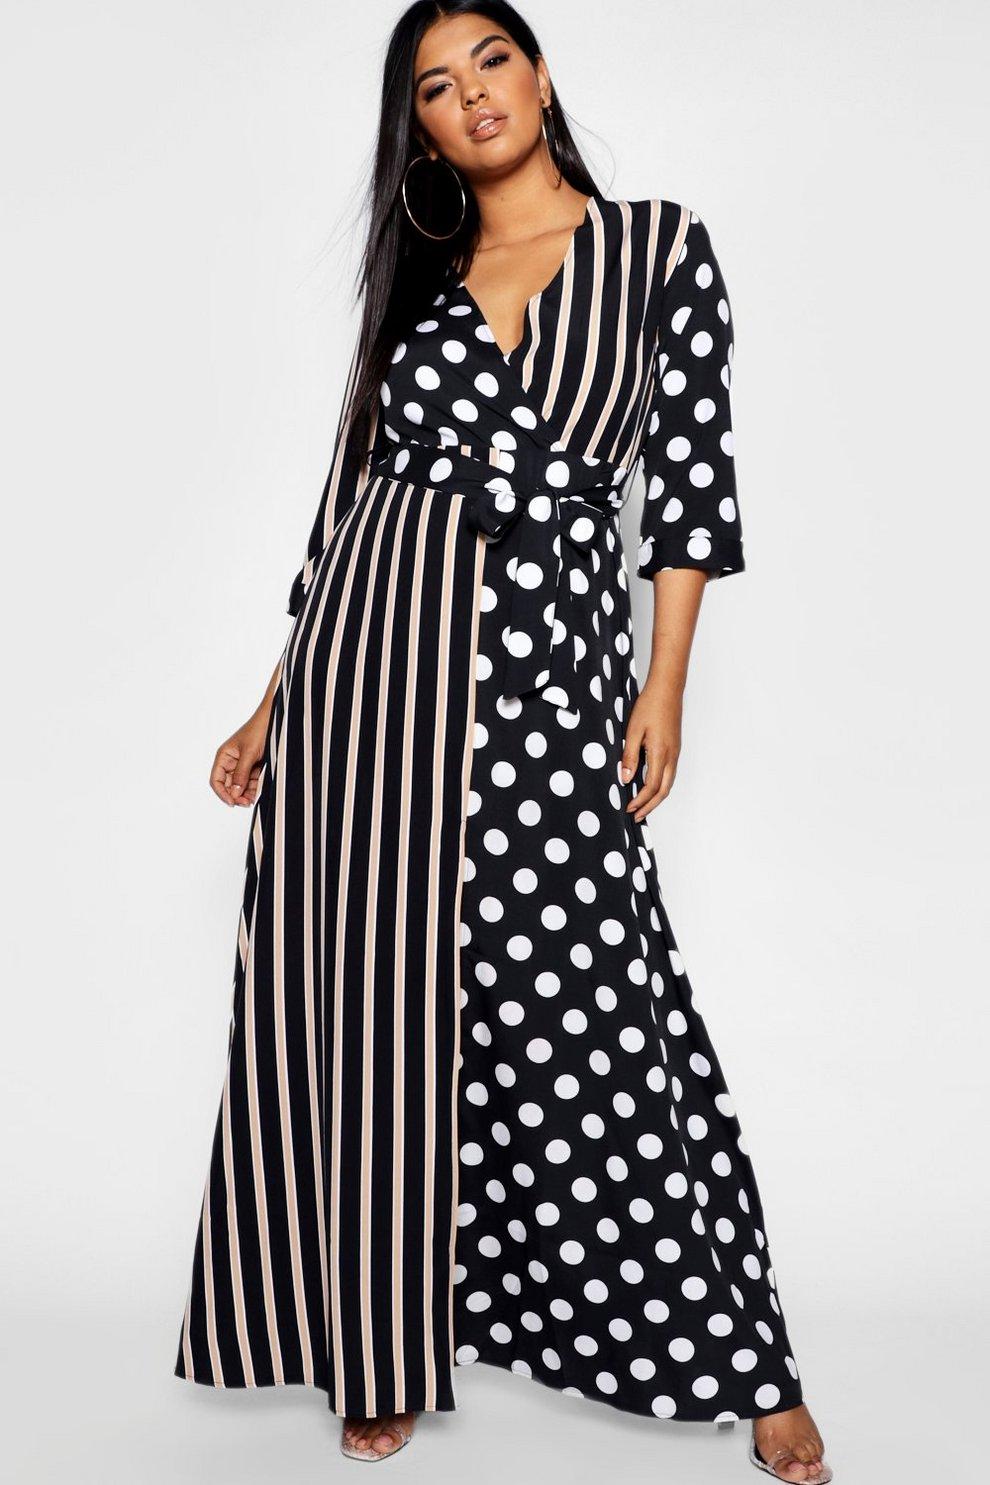 570bb7b64584 Womens Black Plus Polka Dot + Stripe Maxi Shirt Dress